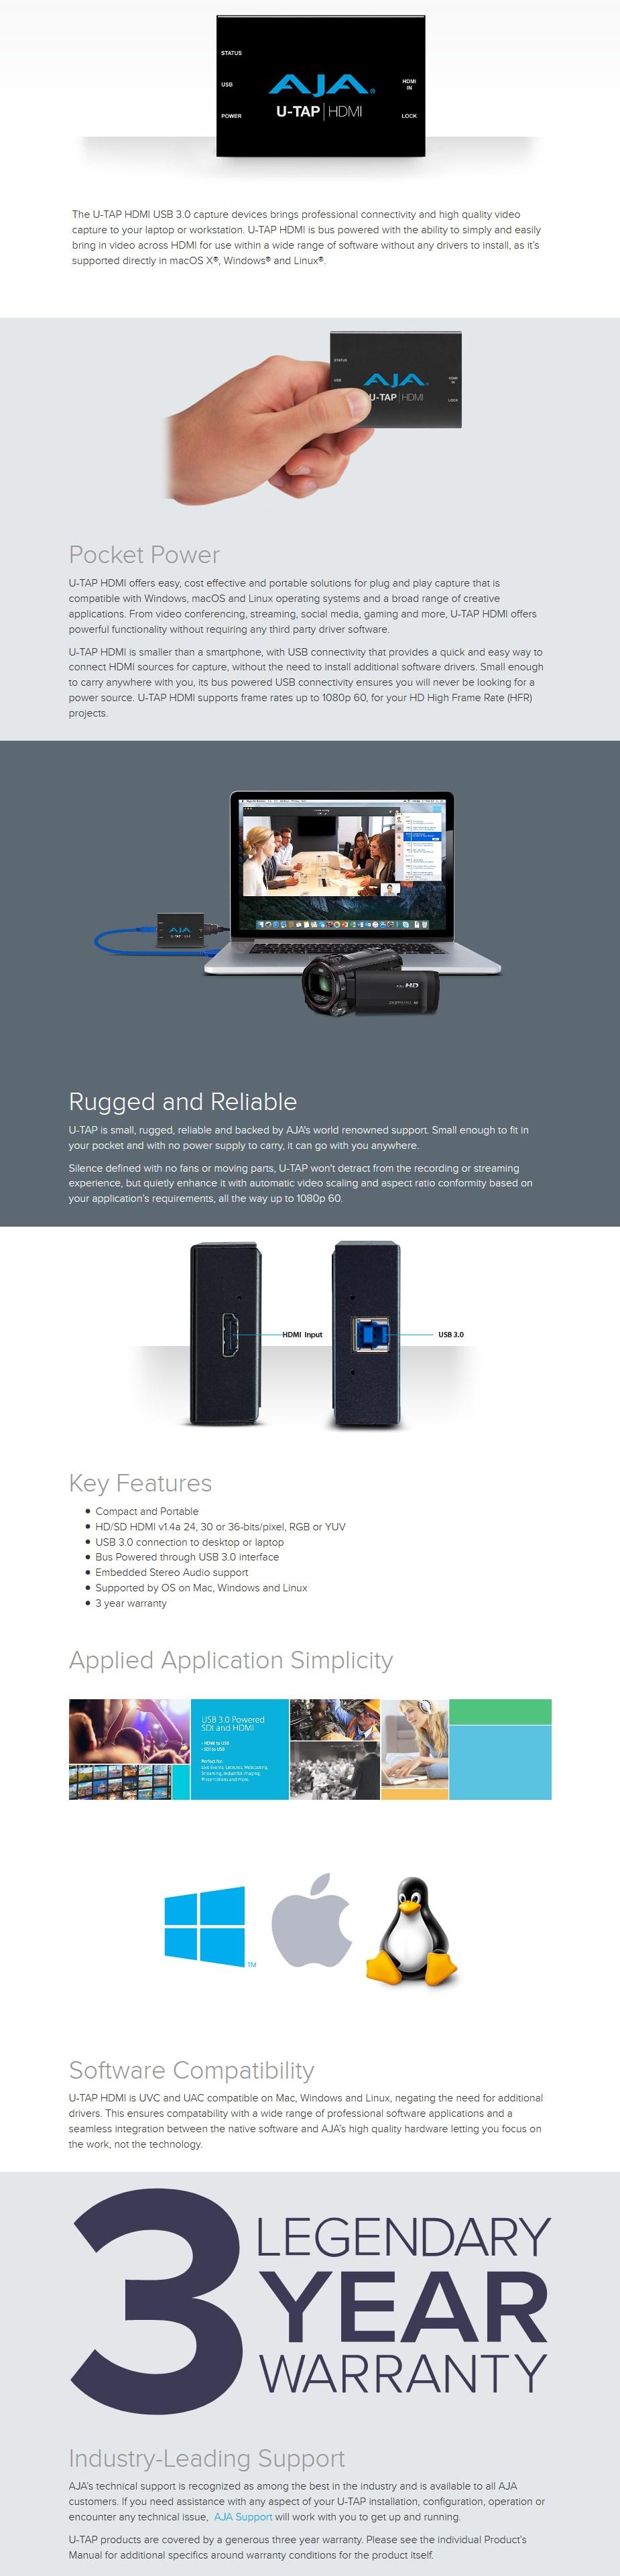 AJA U-TAP HDMI - Simple USB 3.0 Powered HDMI Capture - Overview 1